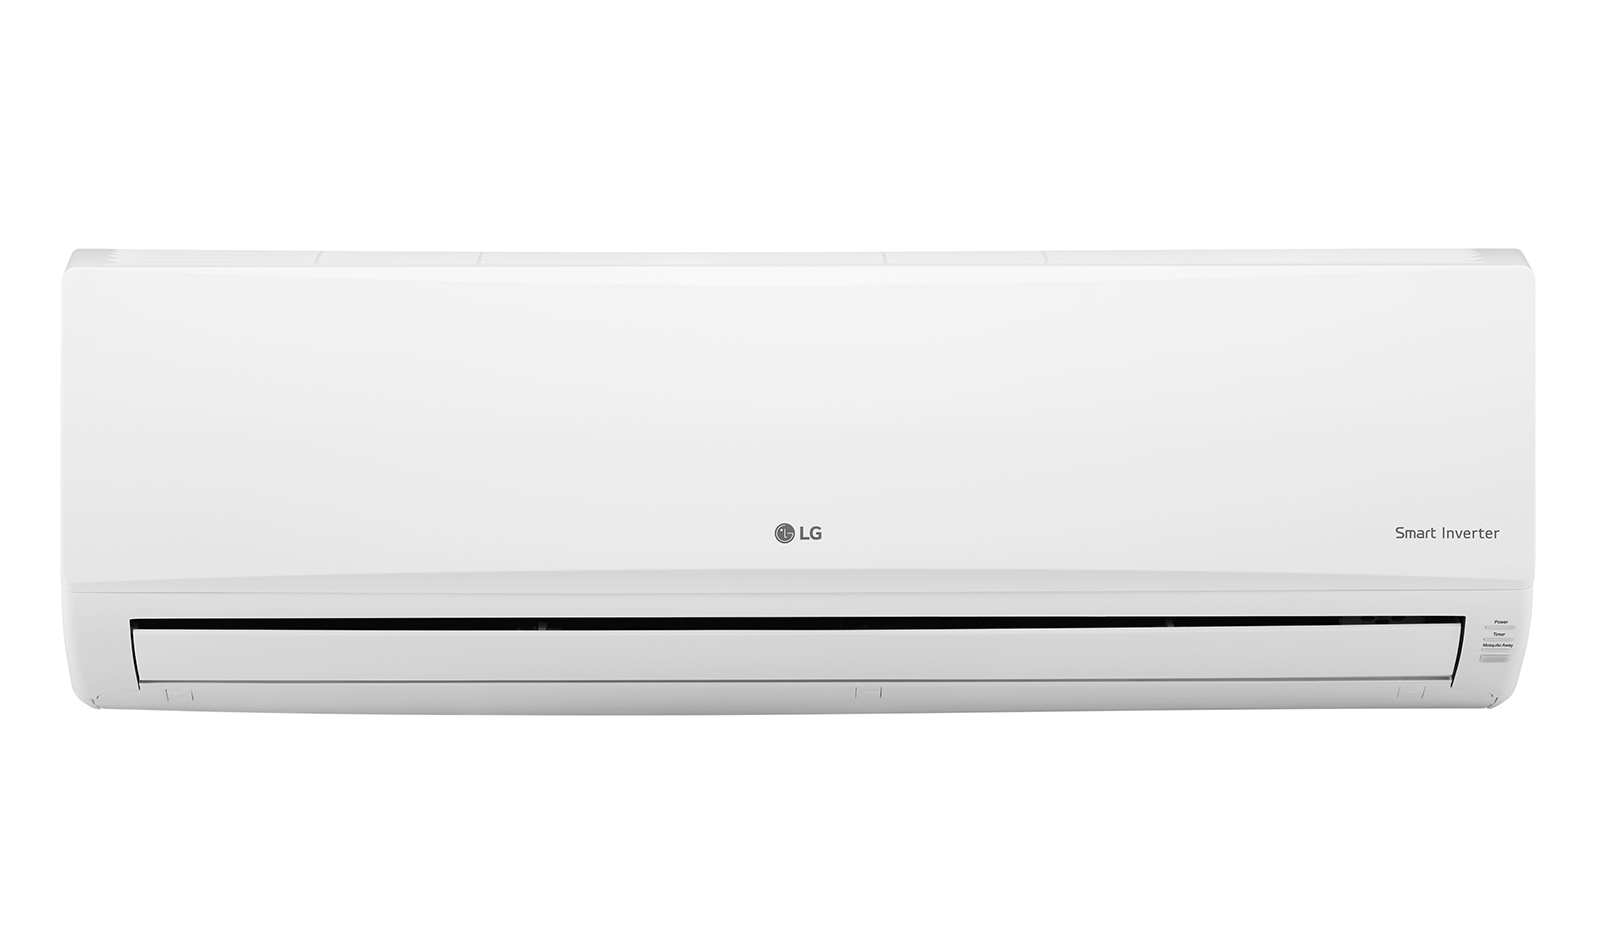 LG Smart Inverter S09PMG